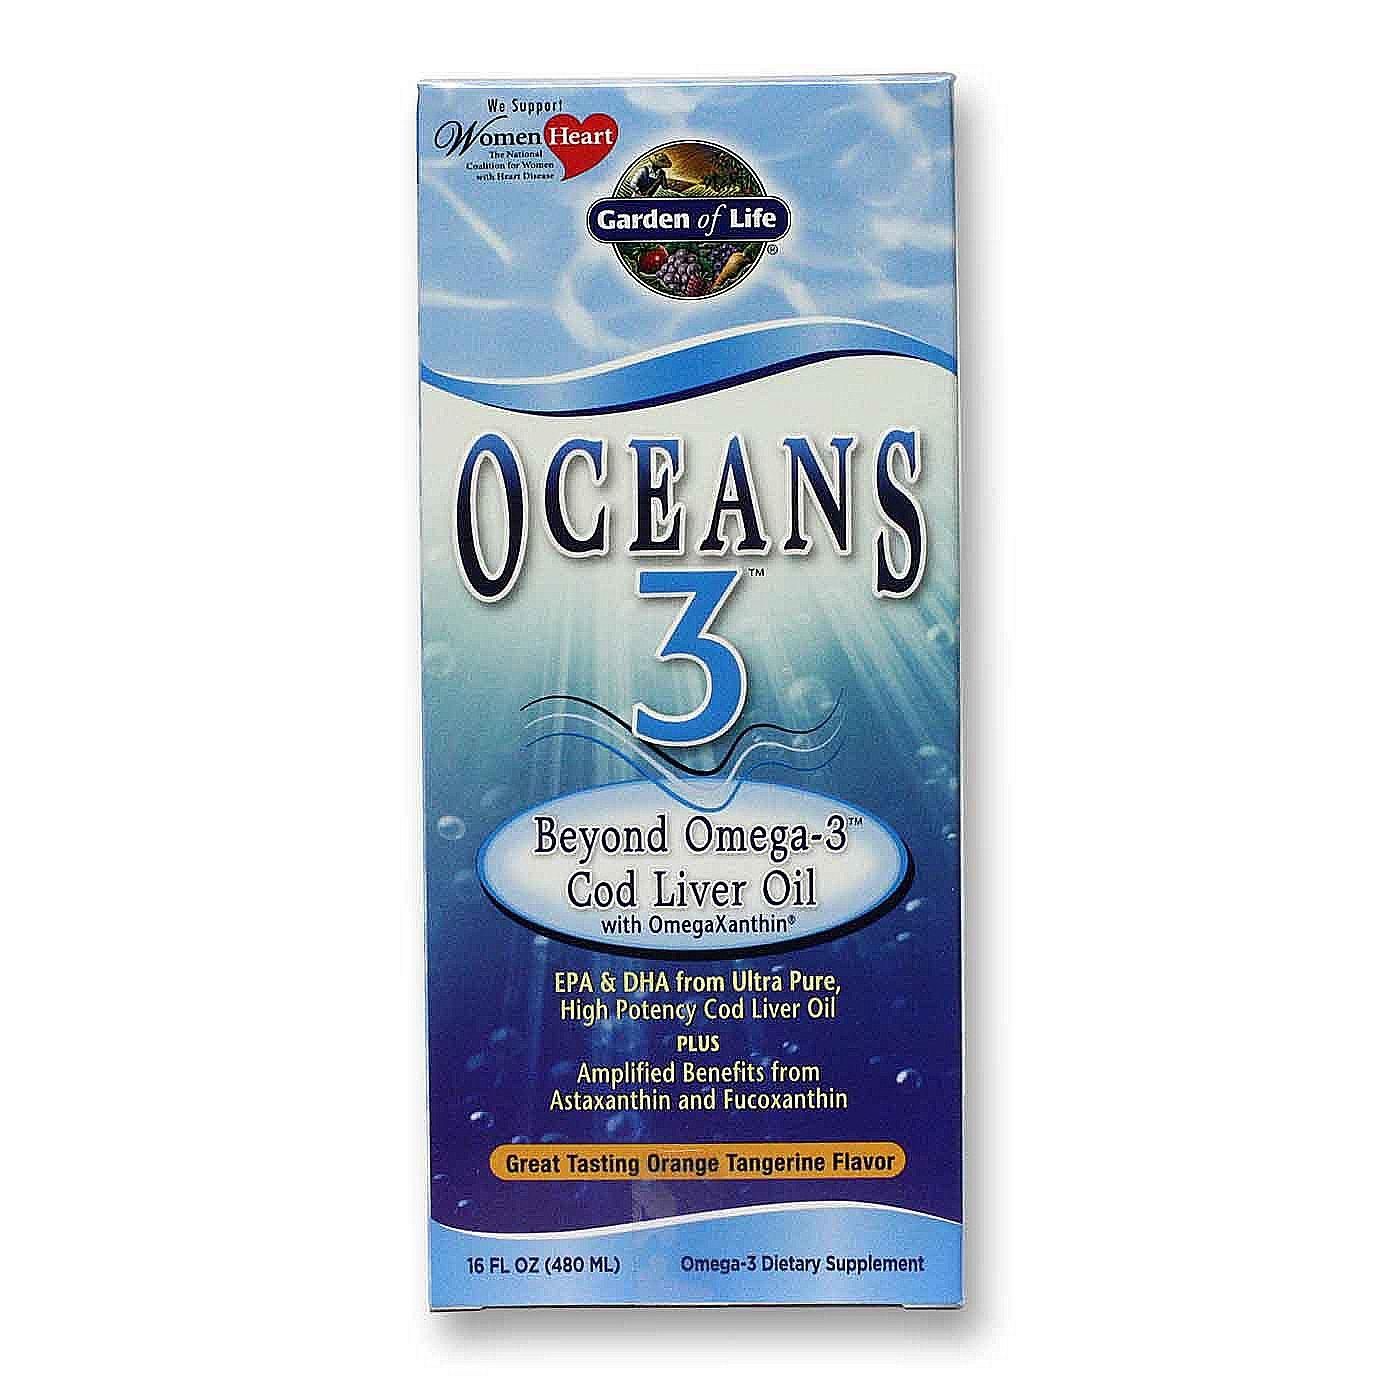 Garden Of Life Oceans 3 Beyond Omega 3 Cod Liver Oil 16 Fl Oz